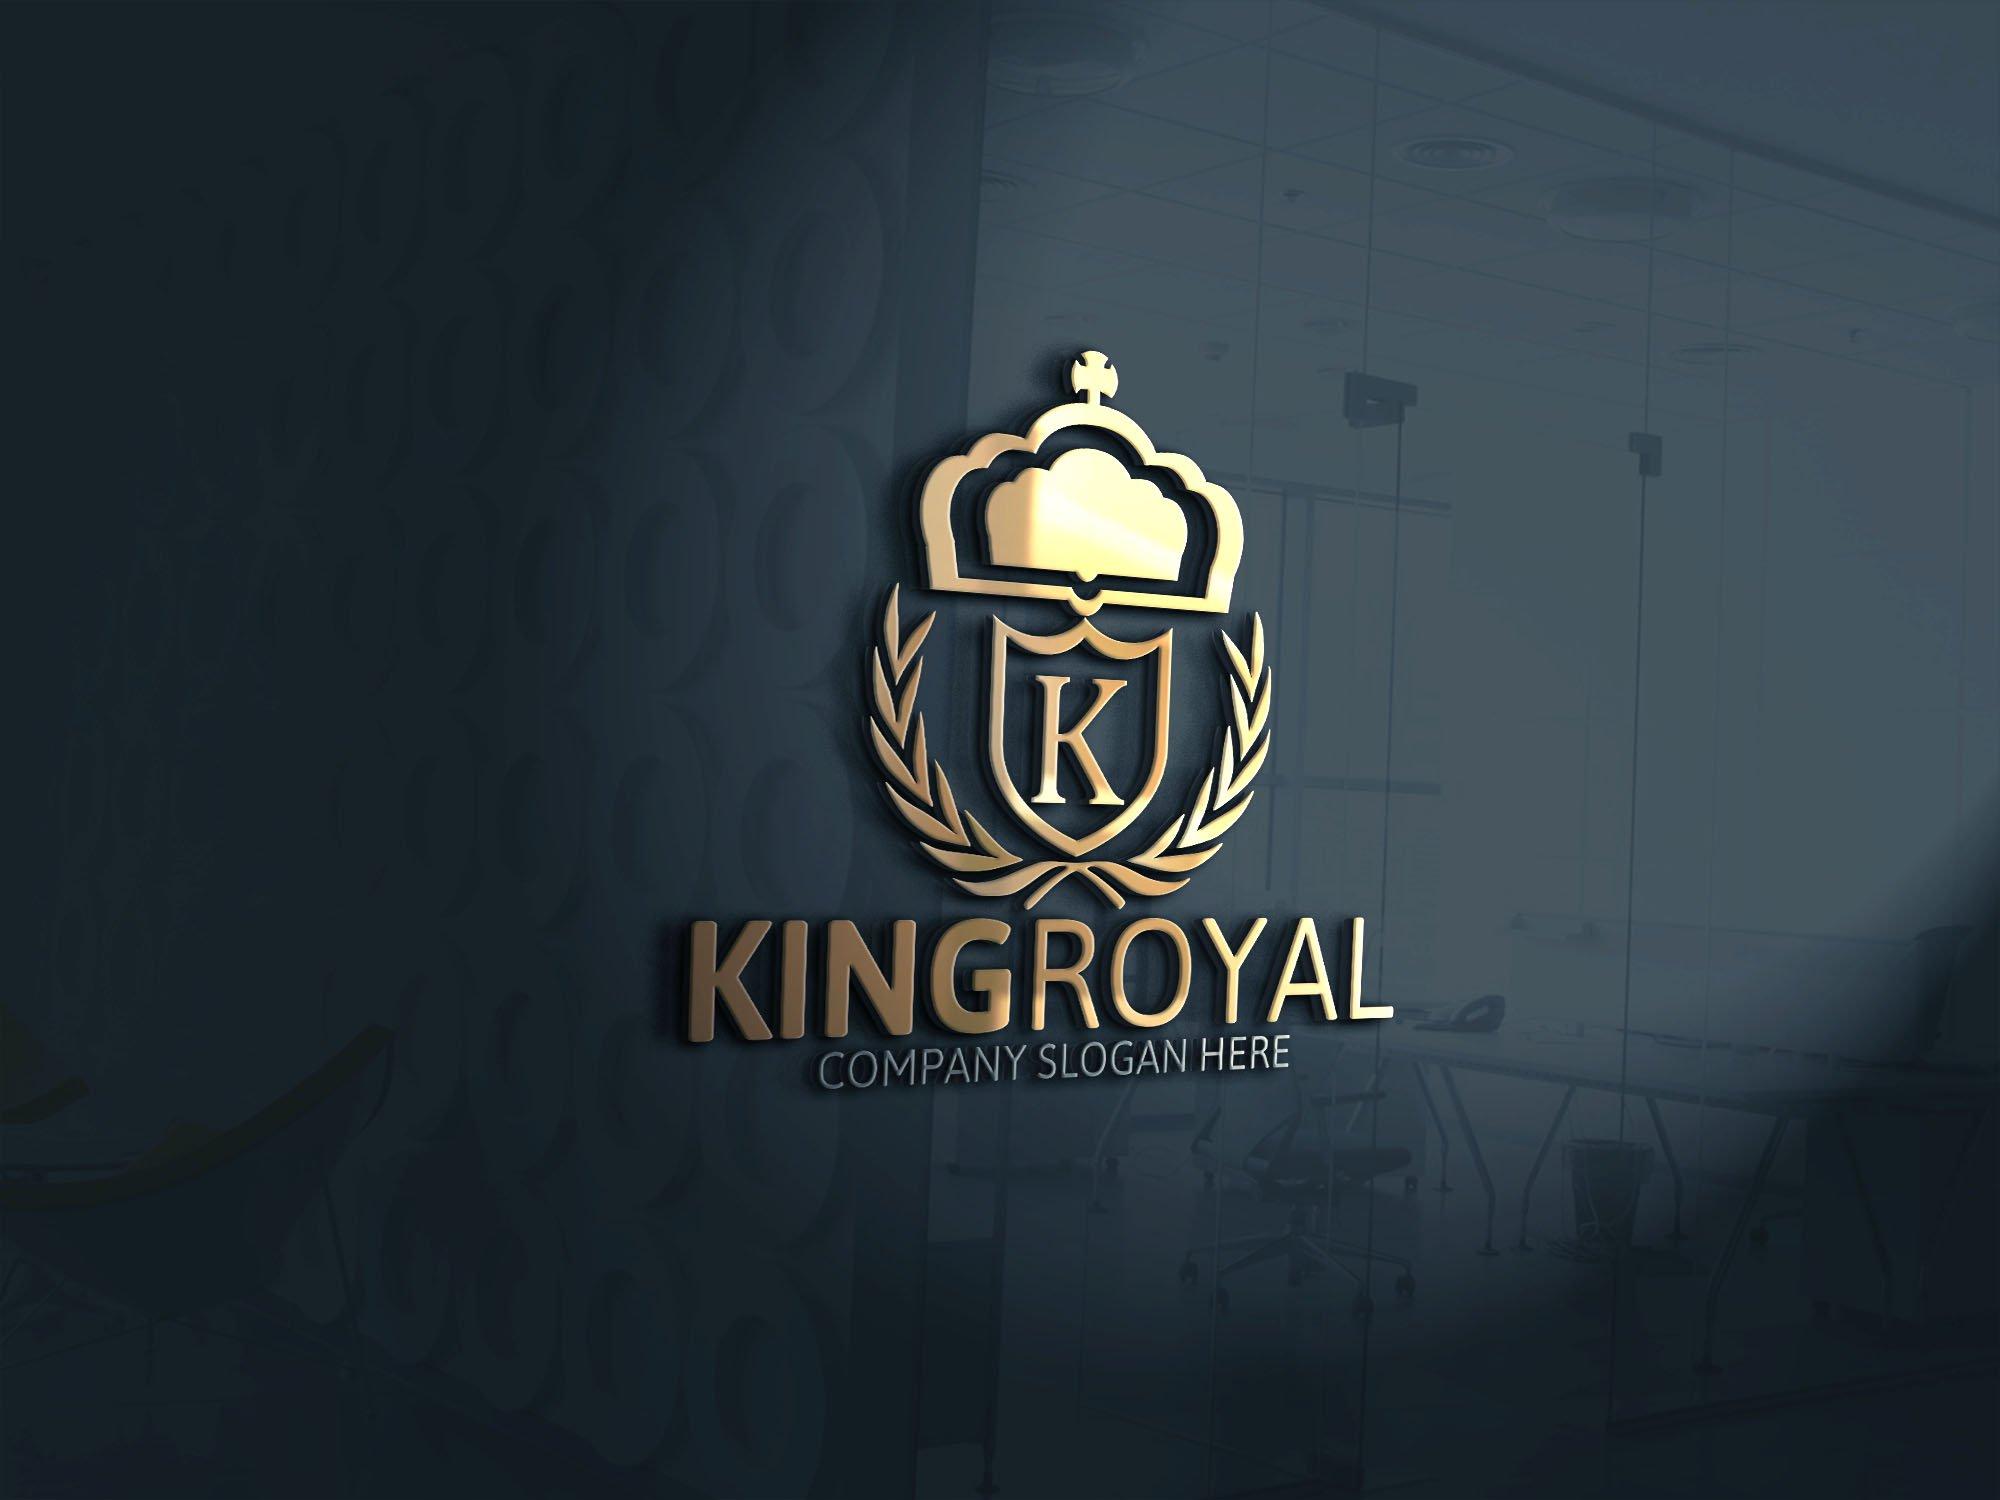 King royal logo logo templates creative market for Hotel name design